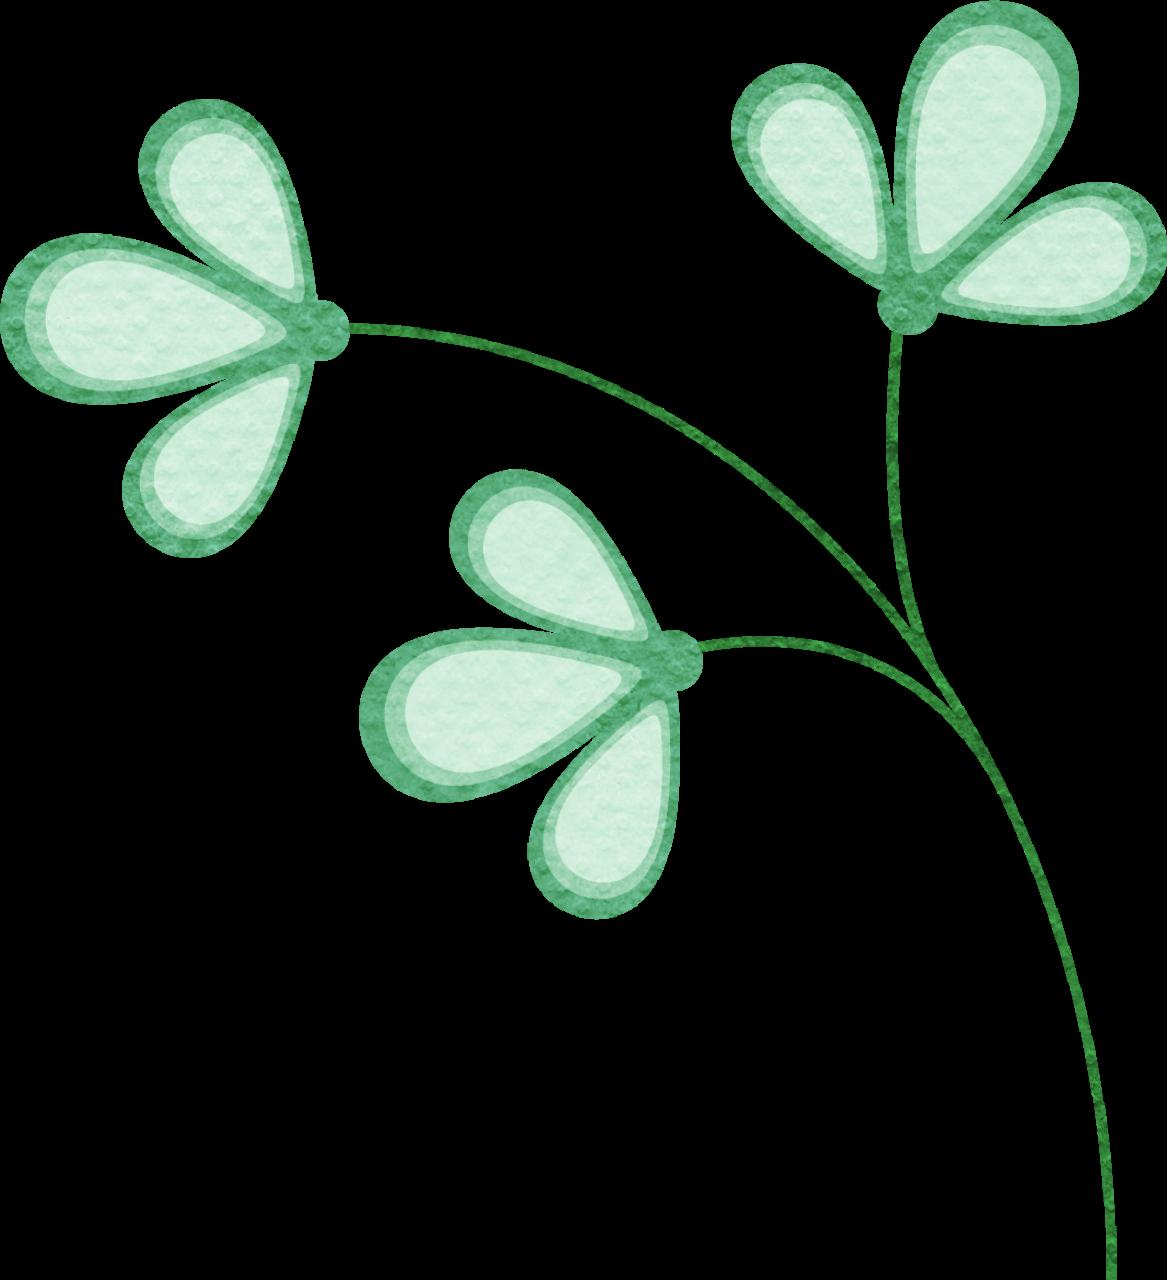 fc af e. Eggplant clipart leaf